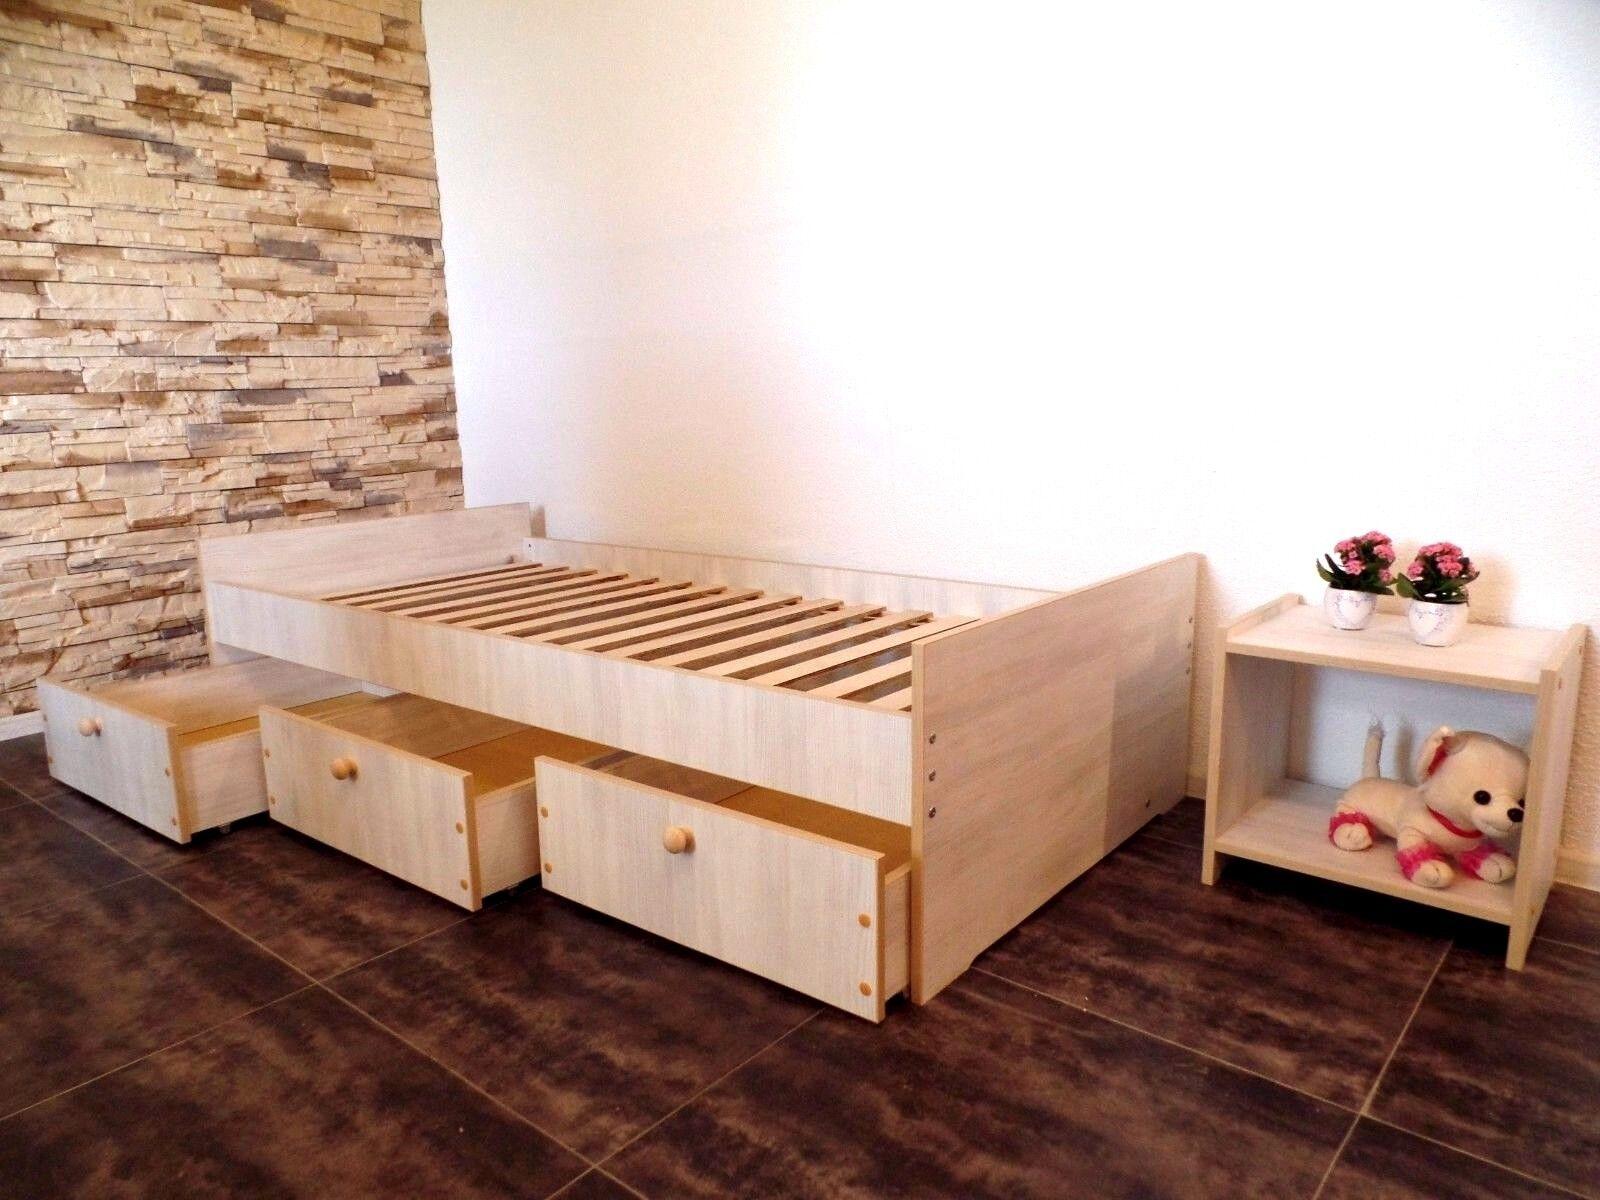 Jugendbett 100x200 funktionsbett einzelbett kojenbett wei grau eur 115 90 picclick es - Funktionsbett 100x200 ...